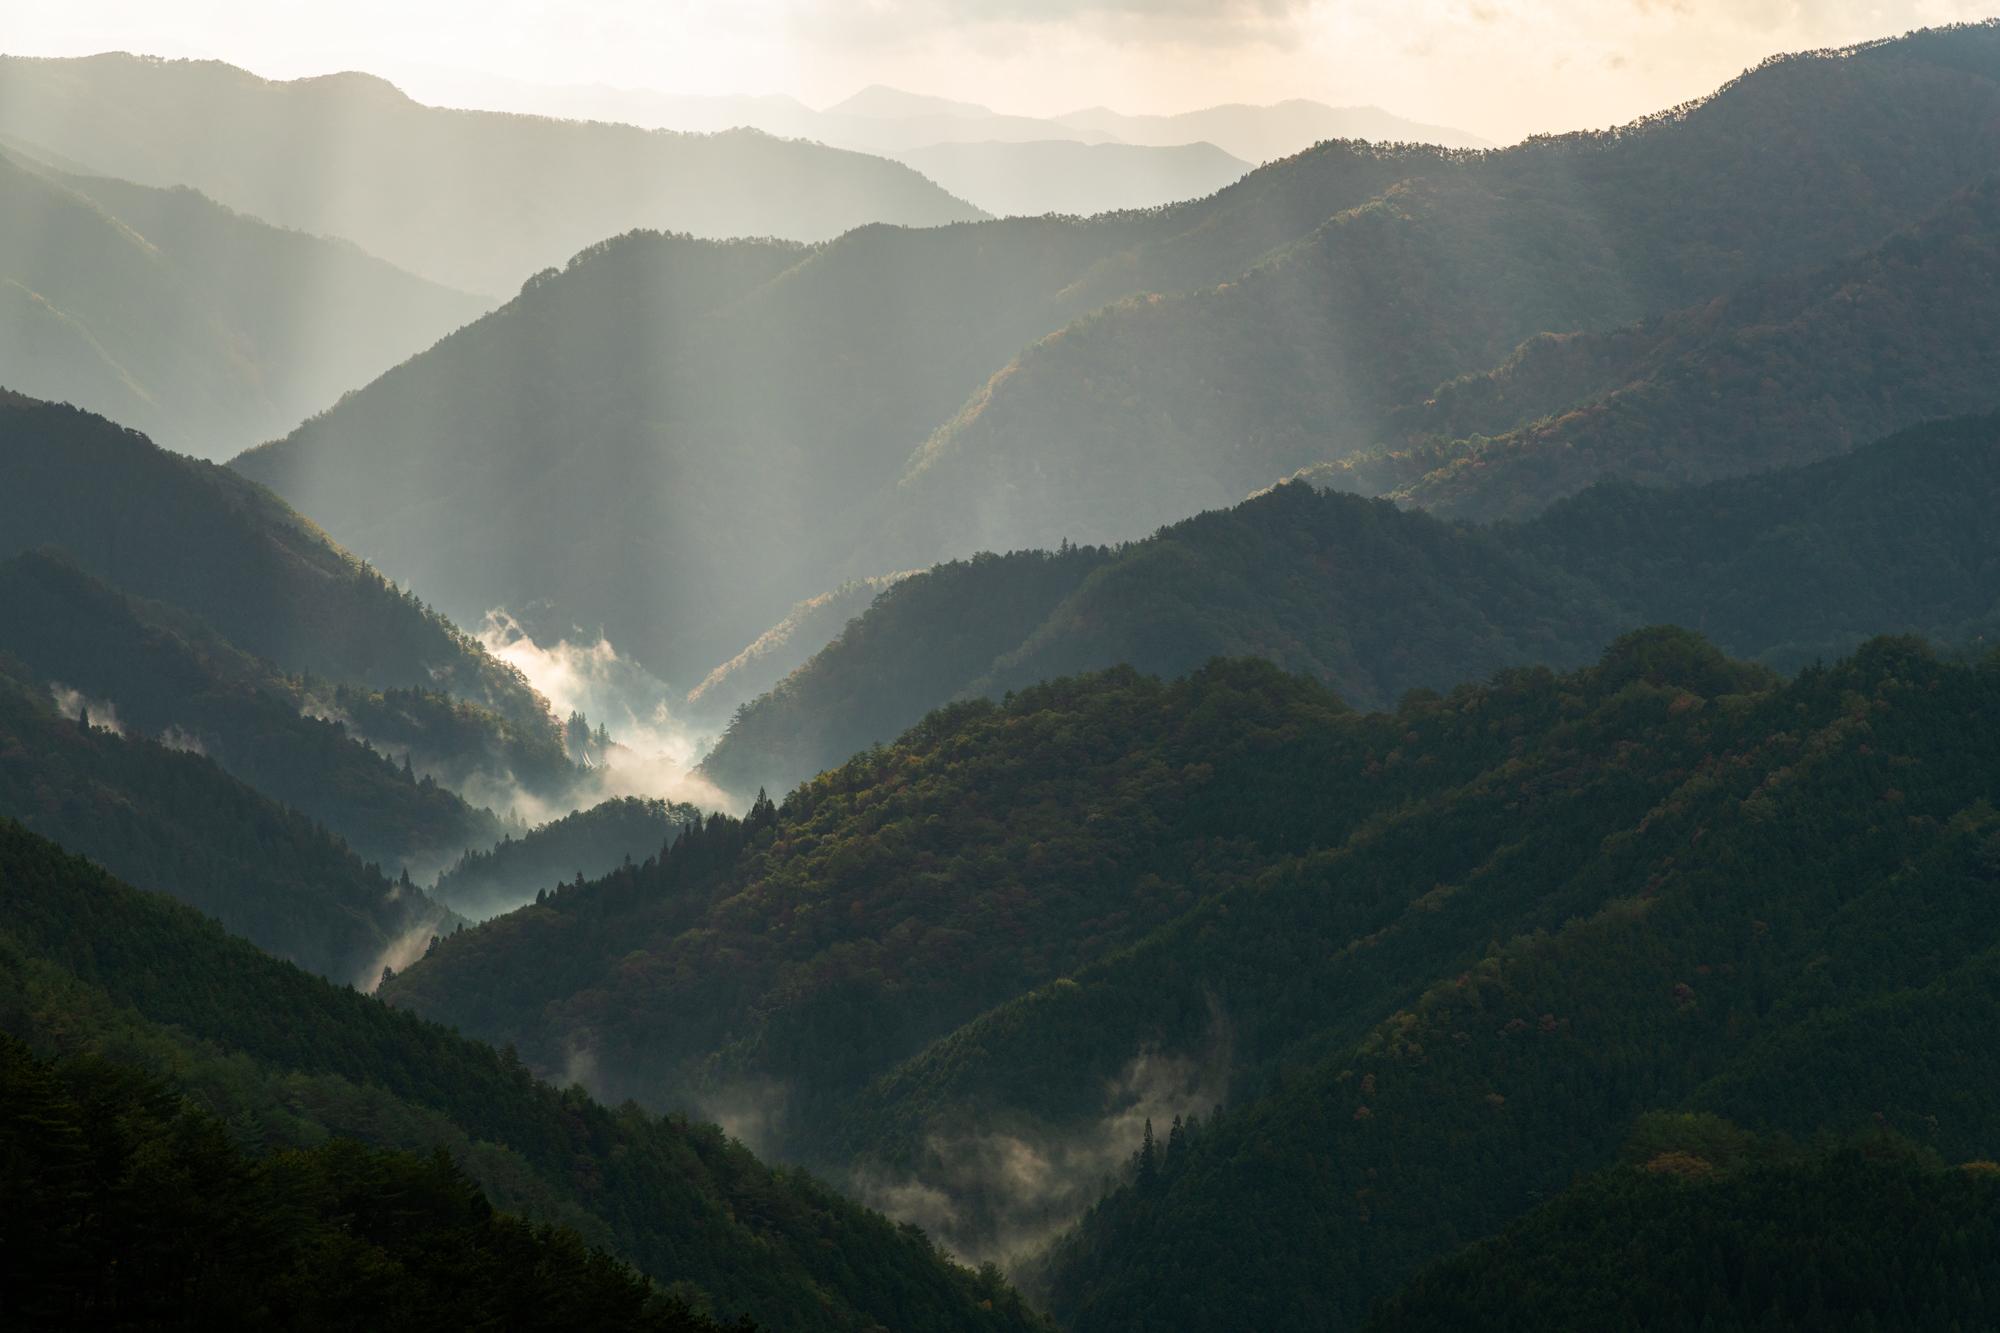 NIKON-CORPORATION_NIKON-D850_2739302386-2739400013_20685 奈良県  野迫川村雲海スポット(雲海や朝日の光芒が見れる秋におすすめの絶景スポット! 撮影した写真の紹介、アクセス情報など)